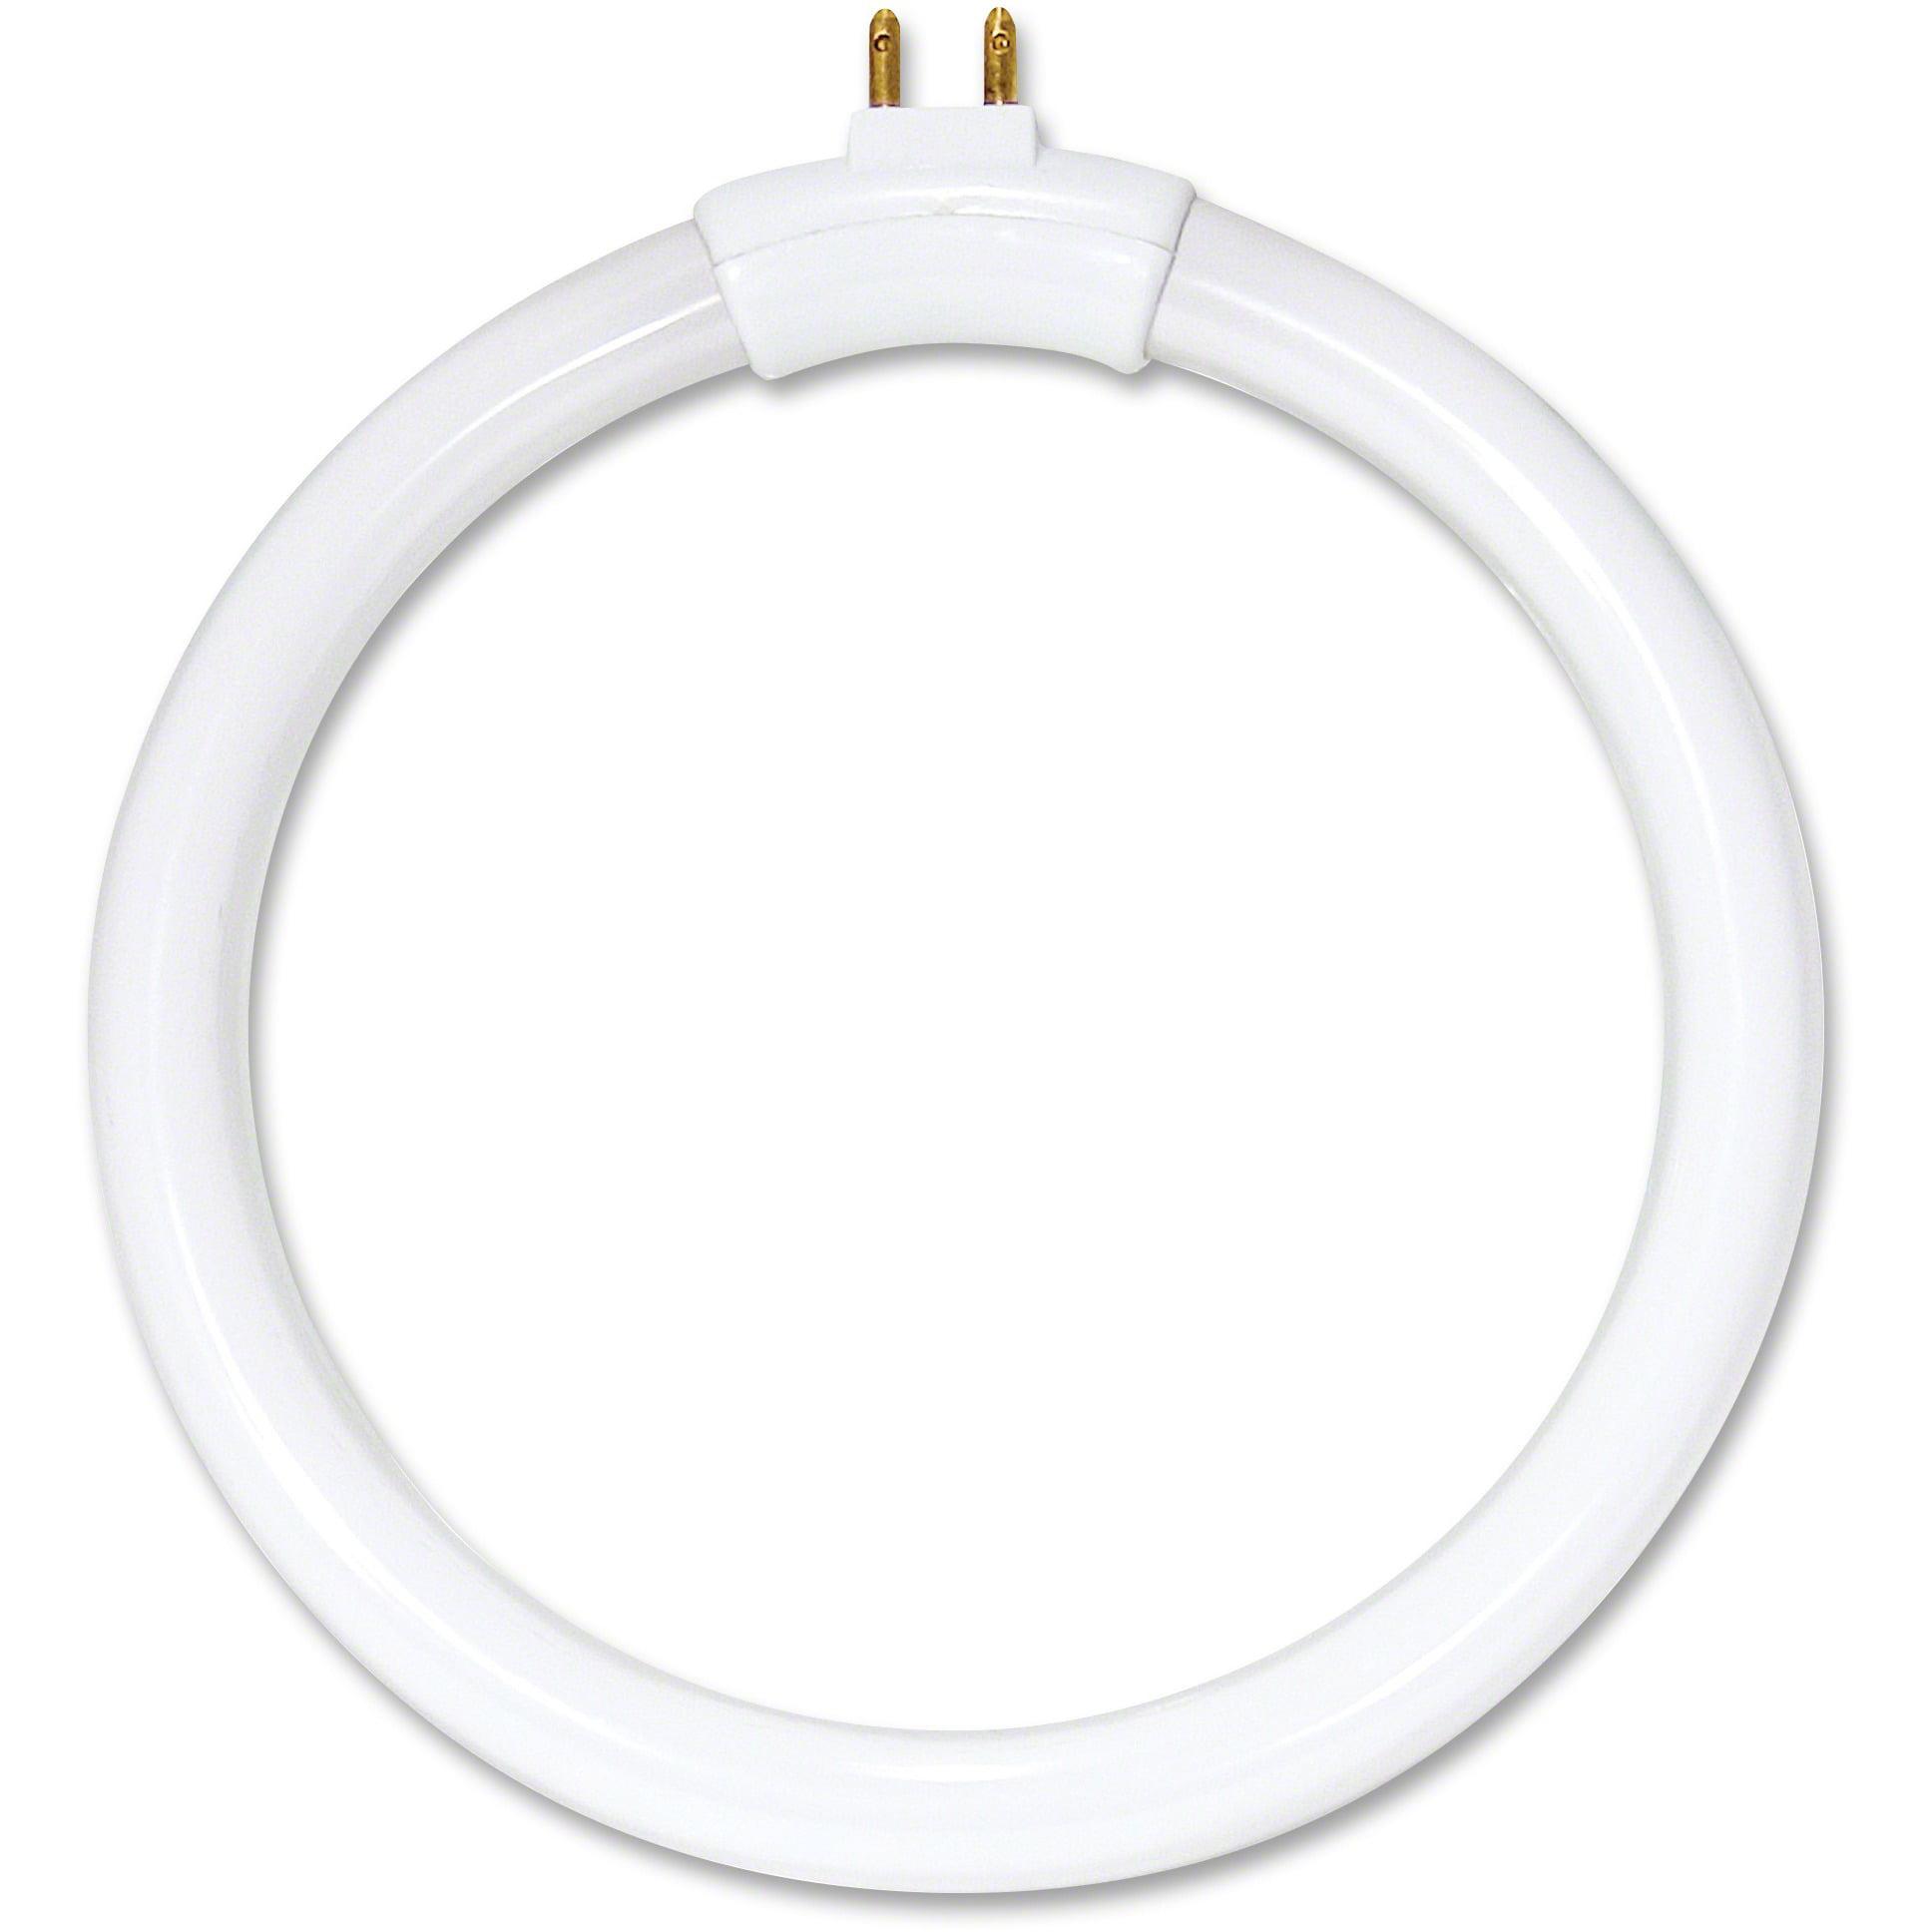 Ledu 12W Circular Tube Replacement Bulb, 1 Each (Quantity)